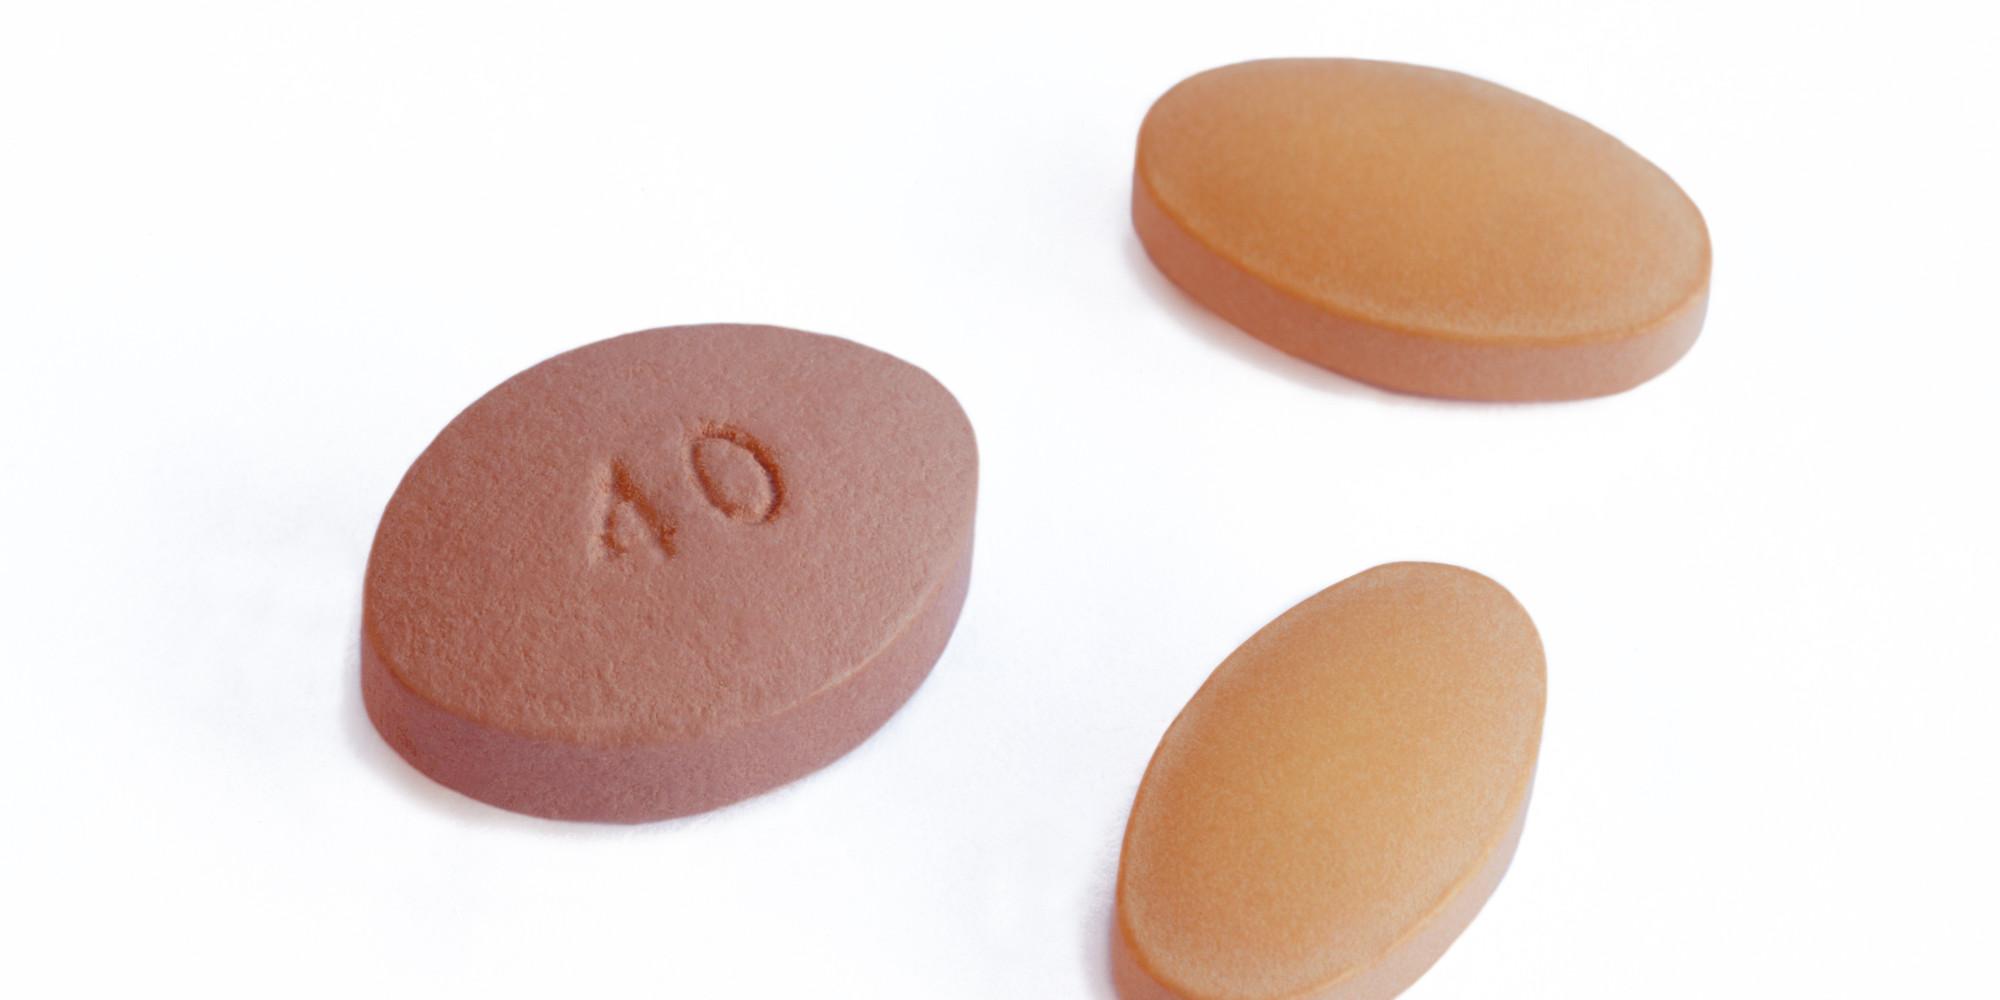 buy generic dostinex online